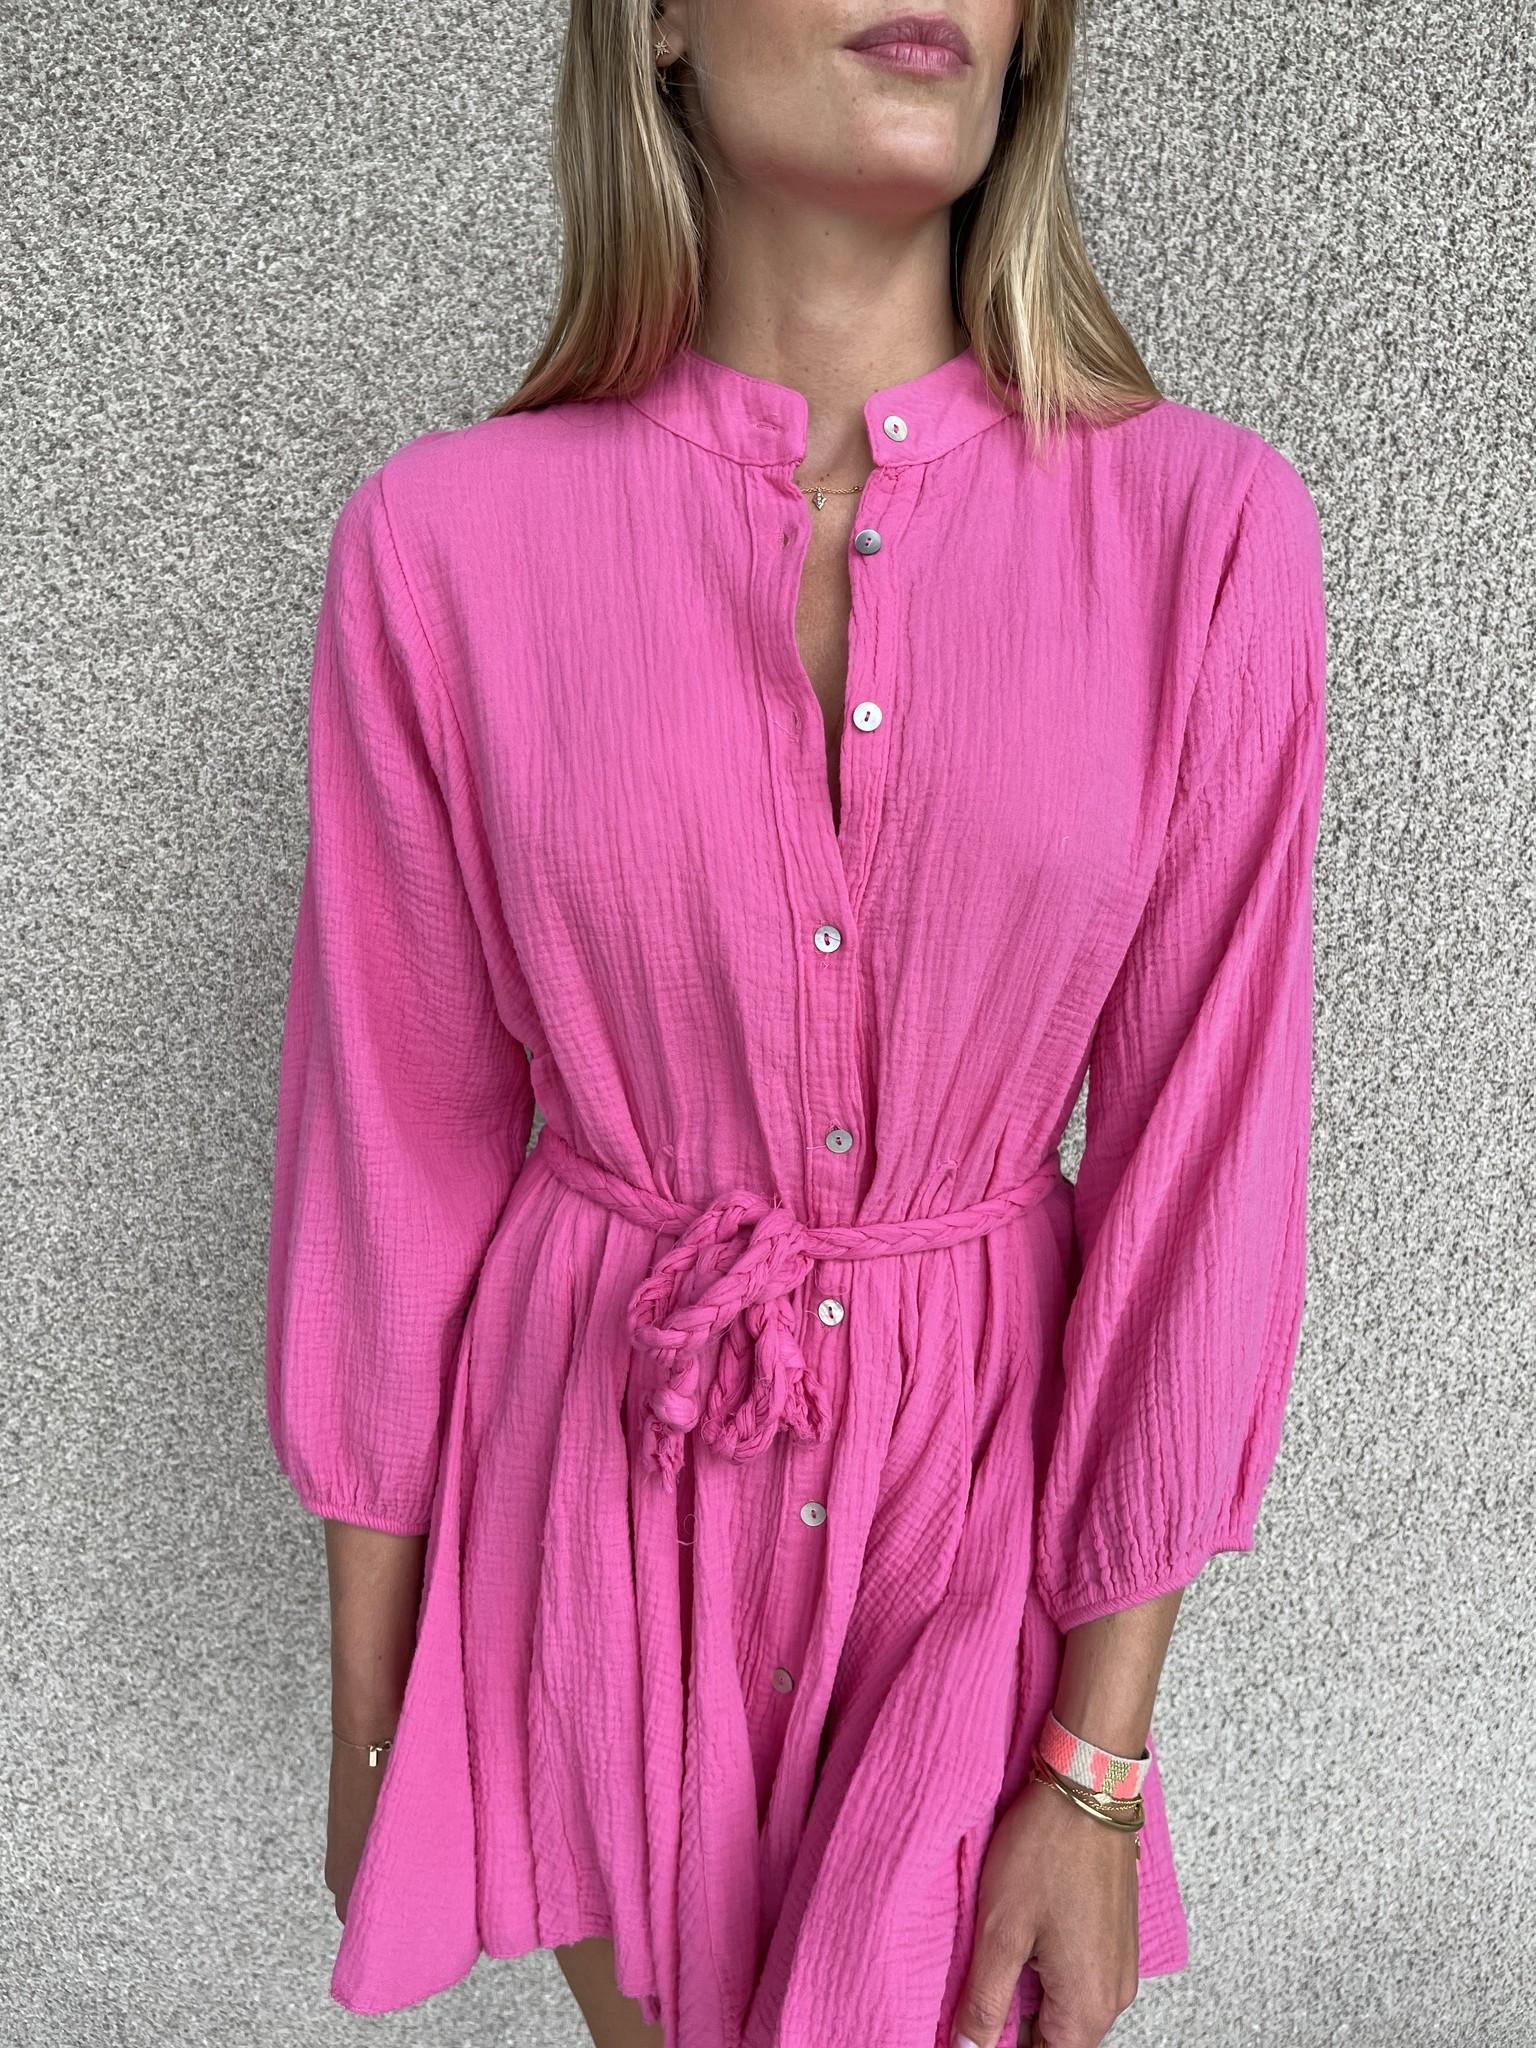 ADELE robe-2